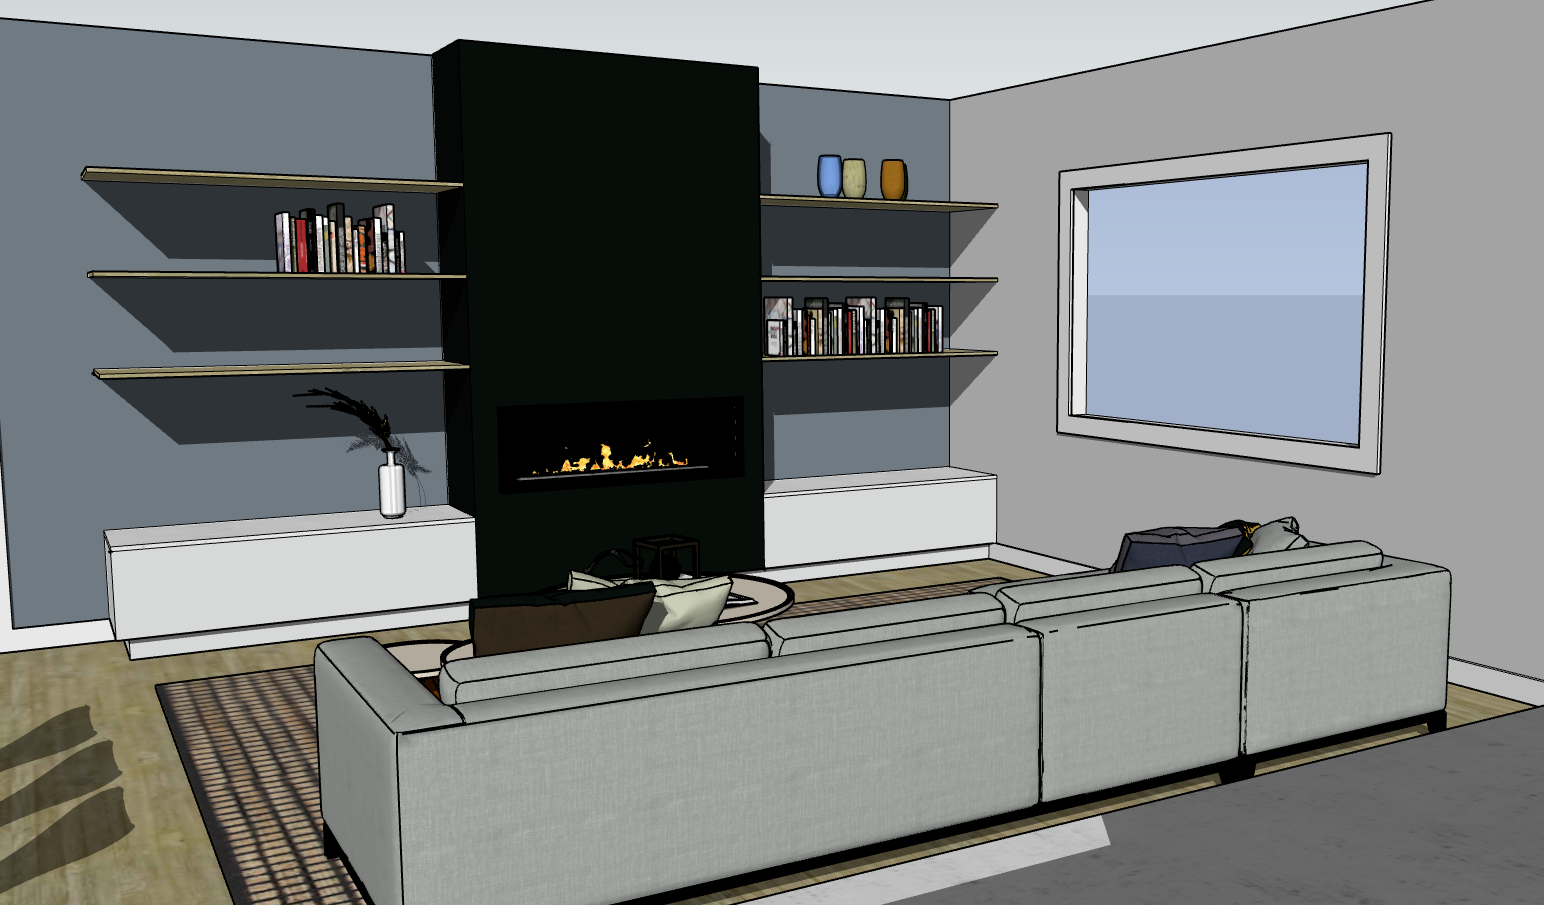 RILEY, ELIZABETH - S12.A2 3D Rendering (Perspective 3).png